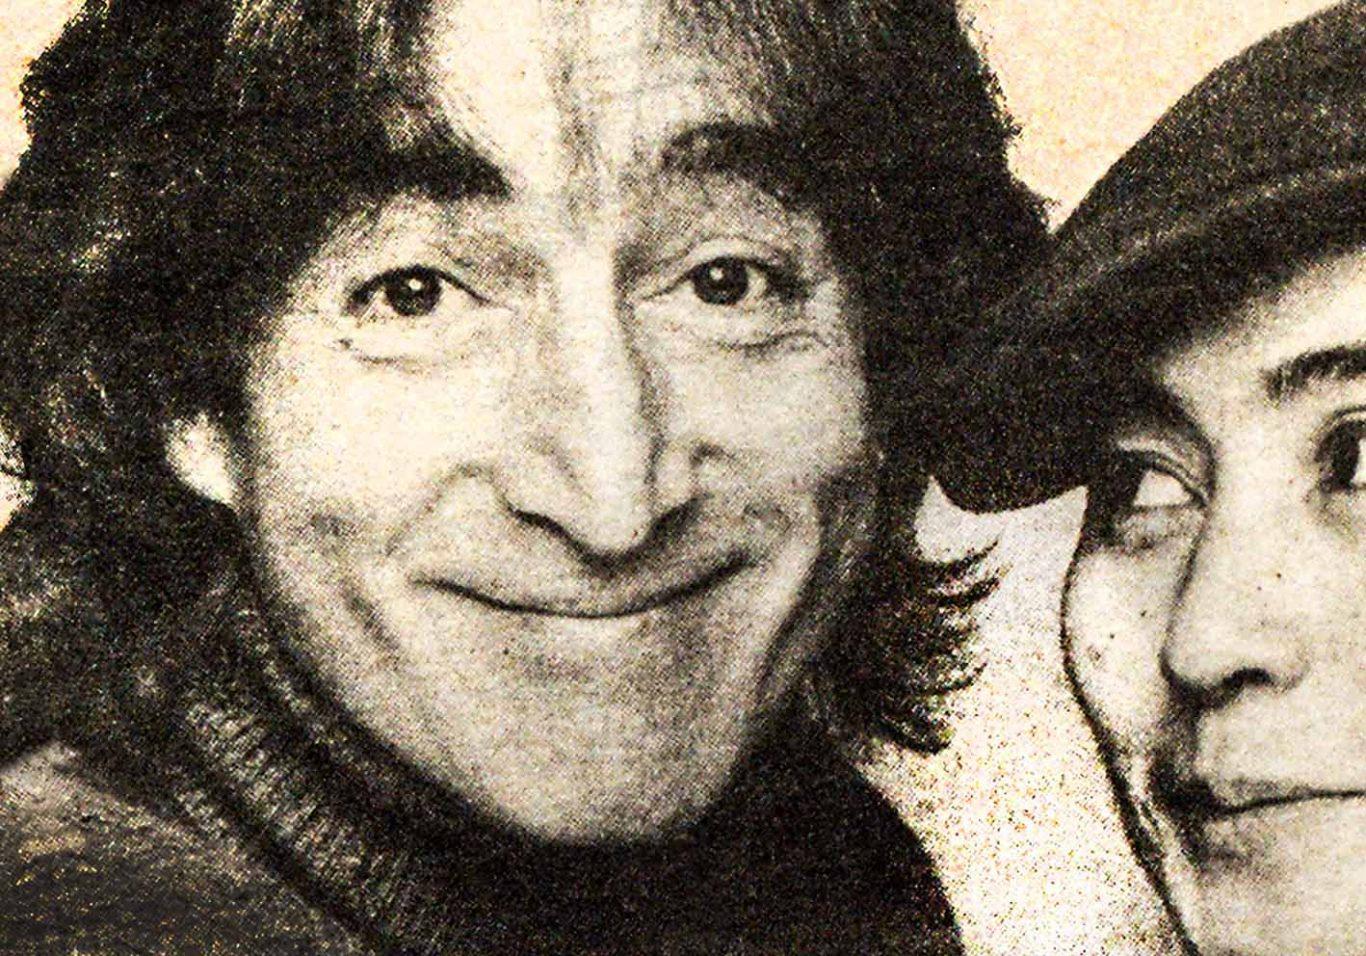 Robert Christgau's 1980 remembrance of John Lennon in the Village Voice